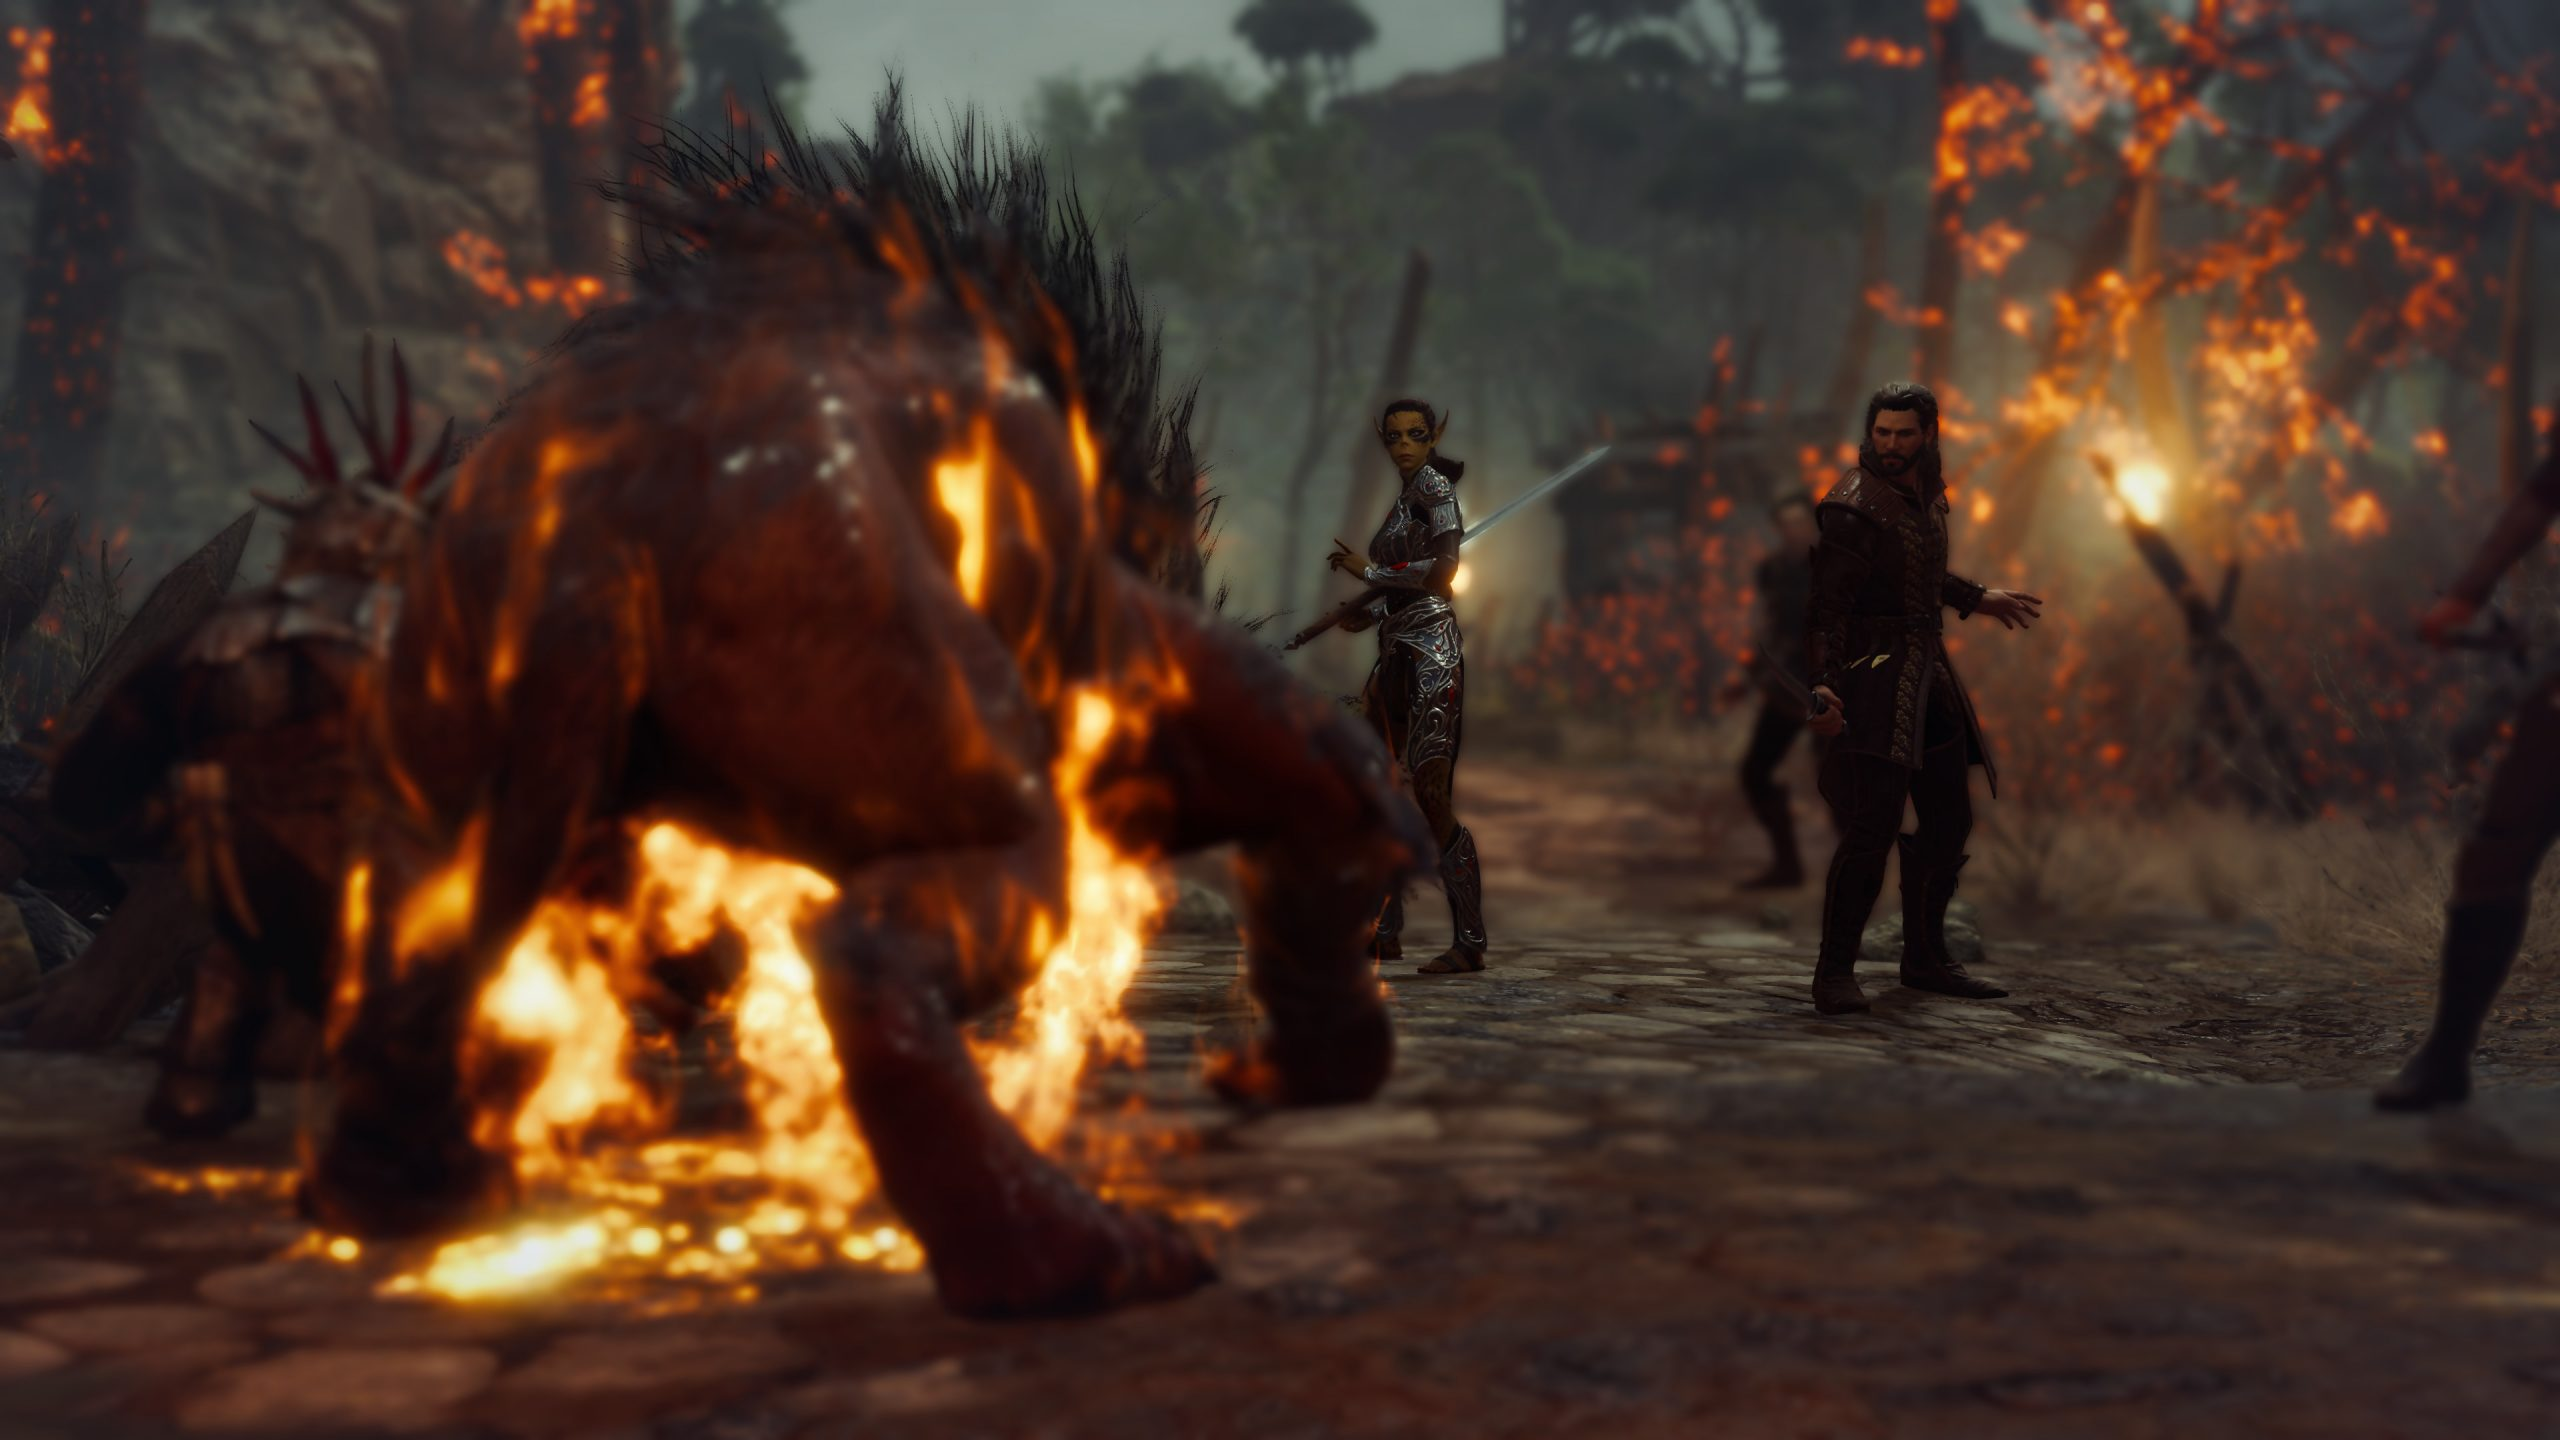 Утечка: скриншоты Baldur's Gate III 5